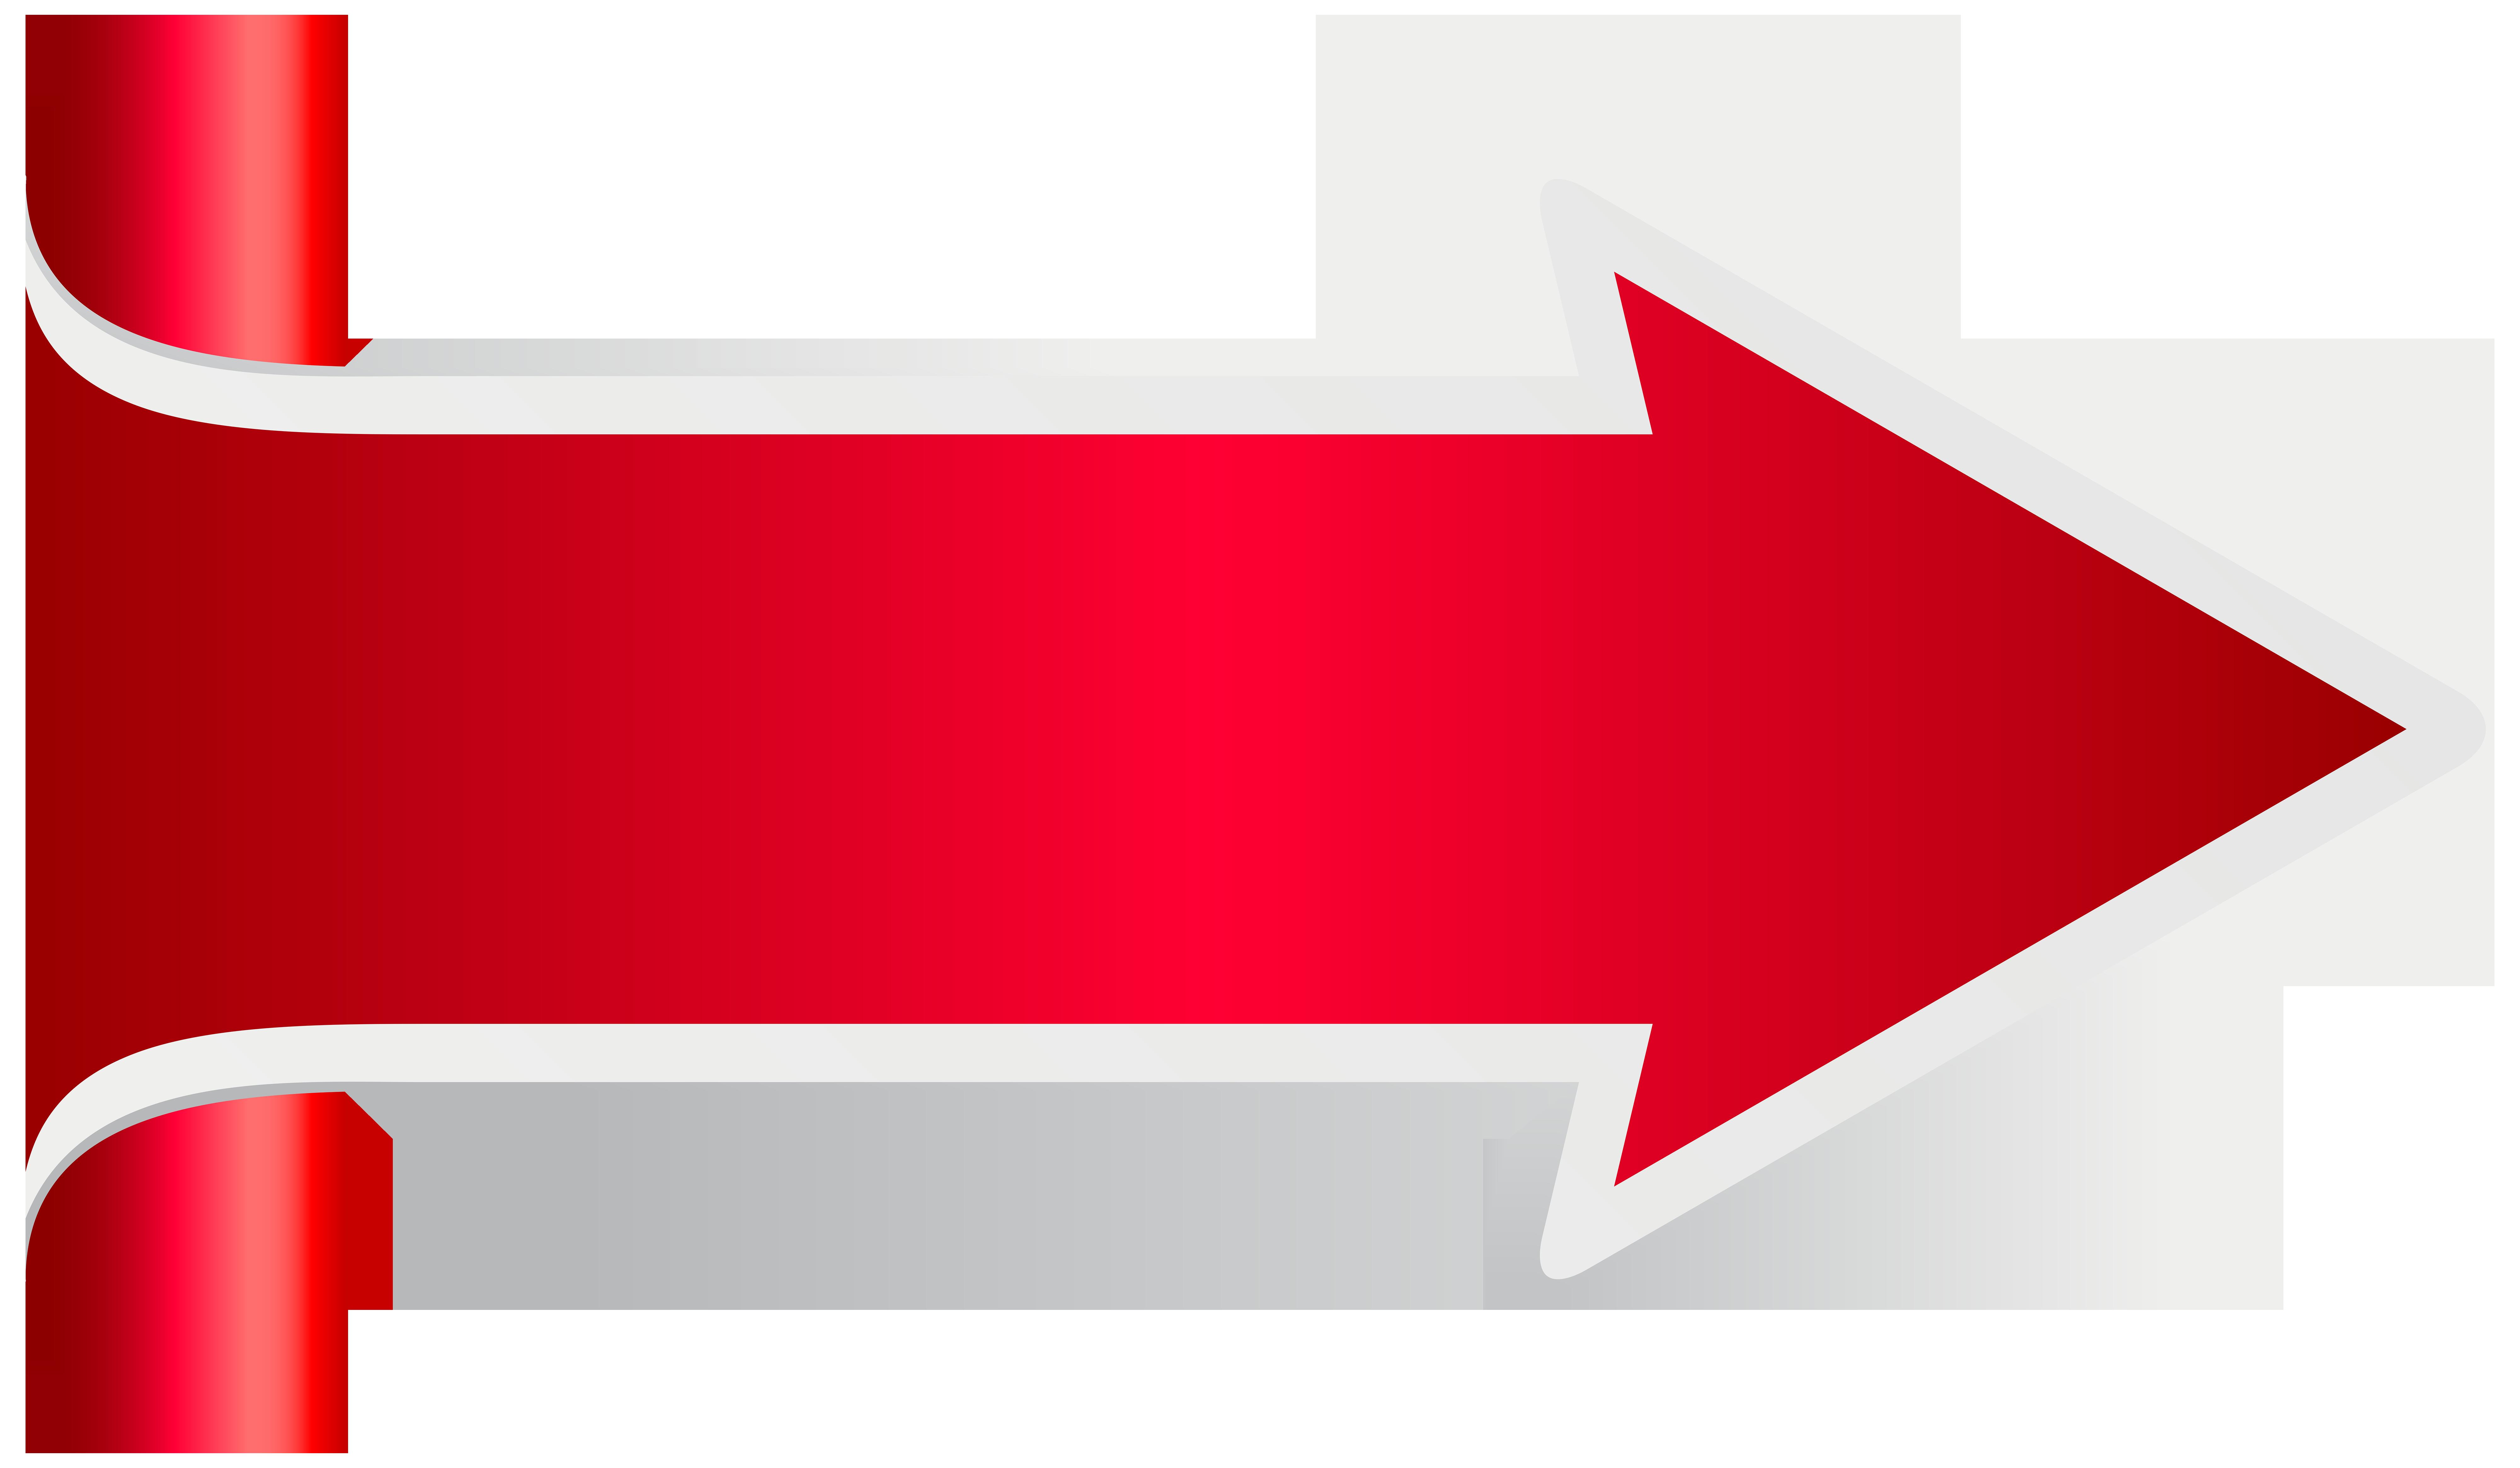 Arrow png images. Red clip art transparent